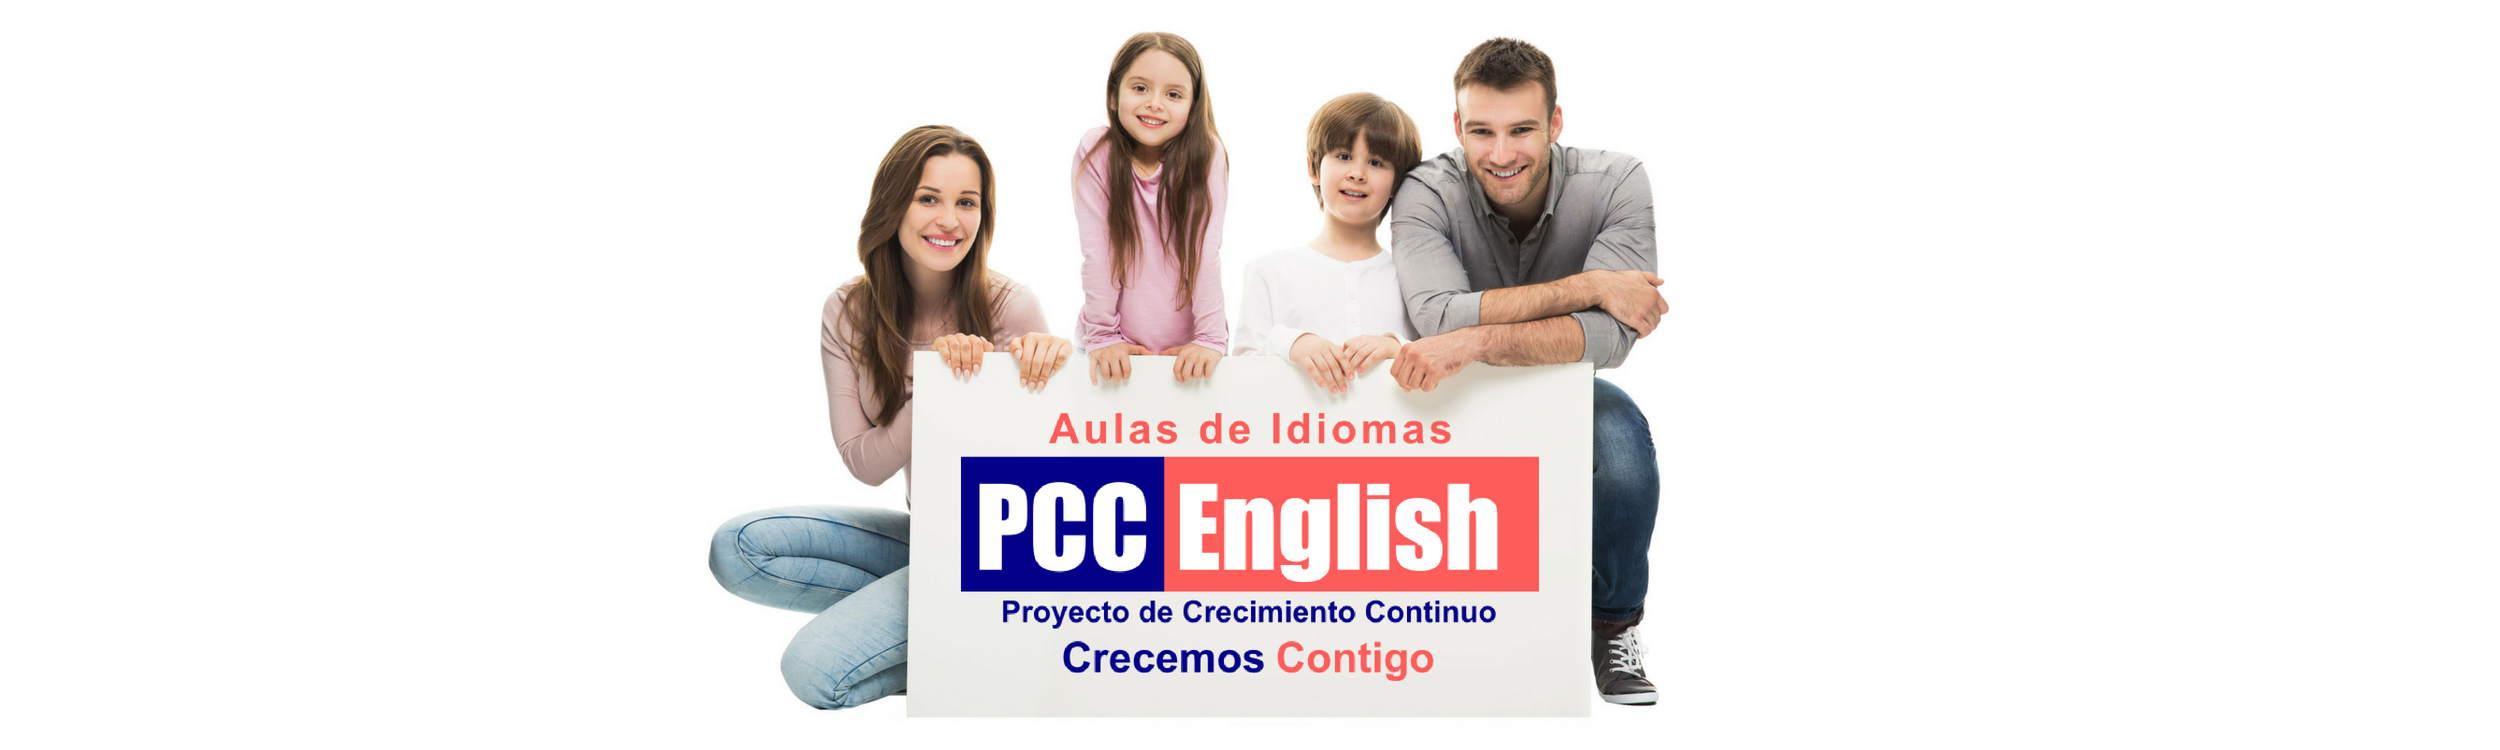 Cabecera PCC English